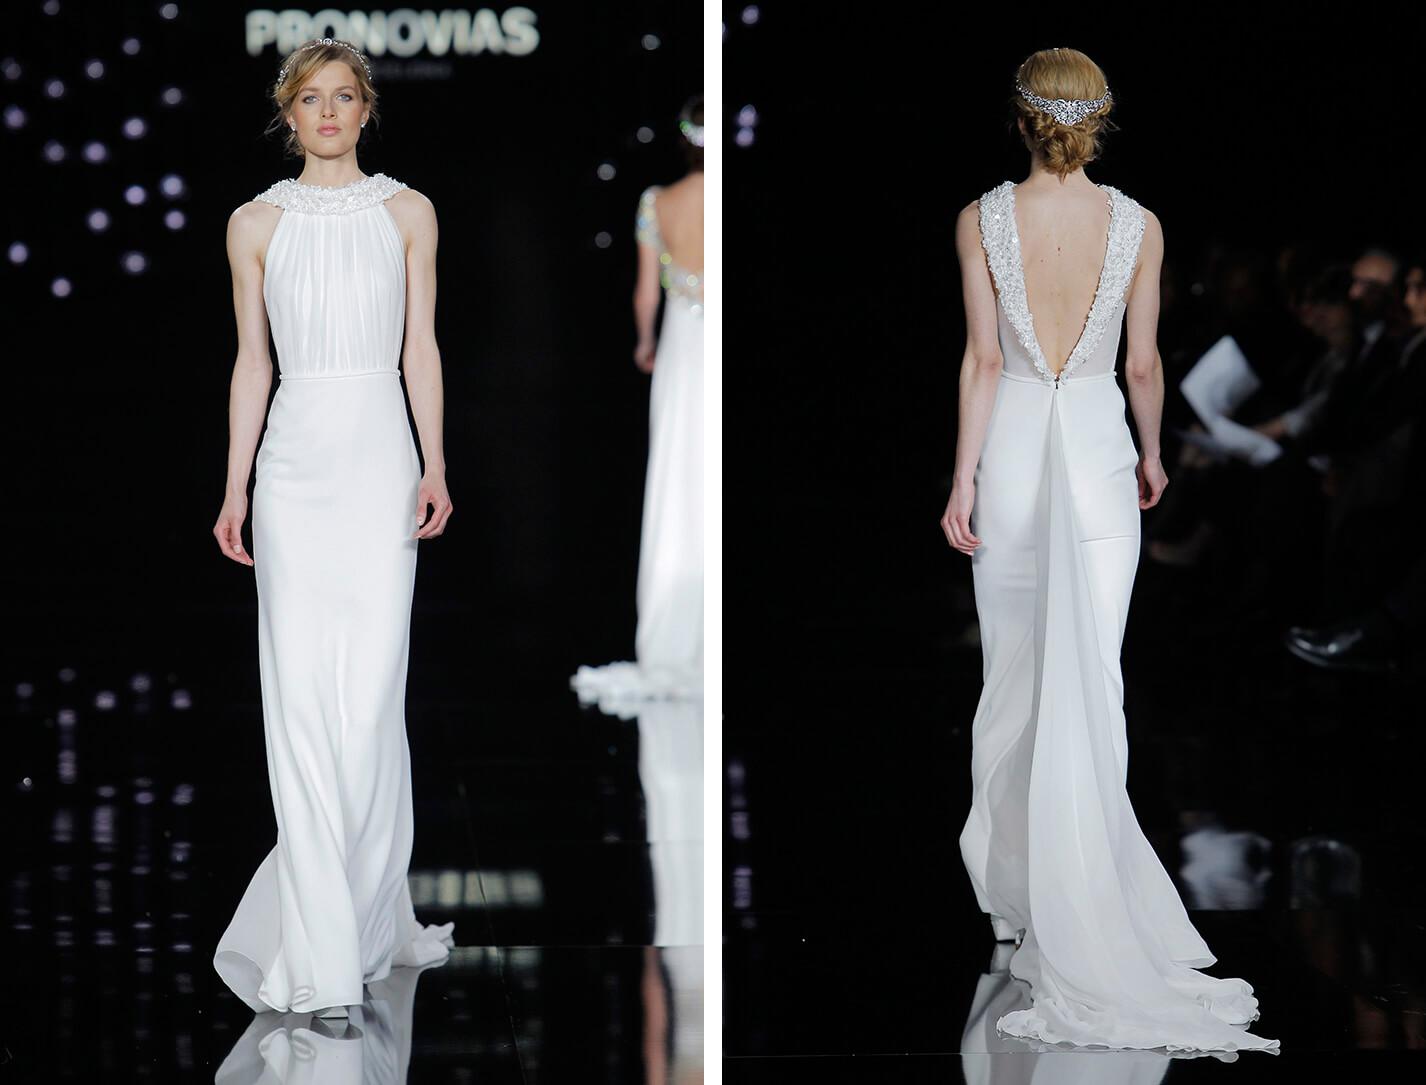 PRONOVIAS_Fashion_Show_2017_Noemi